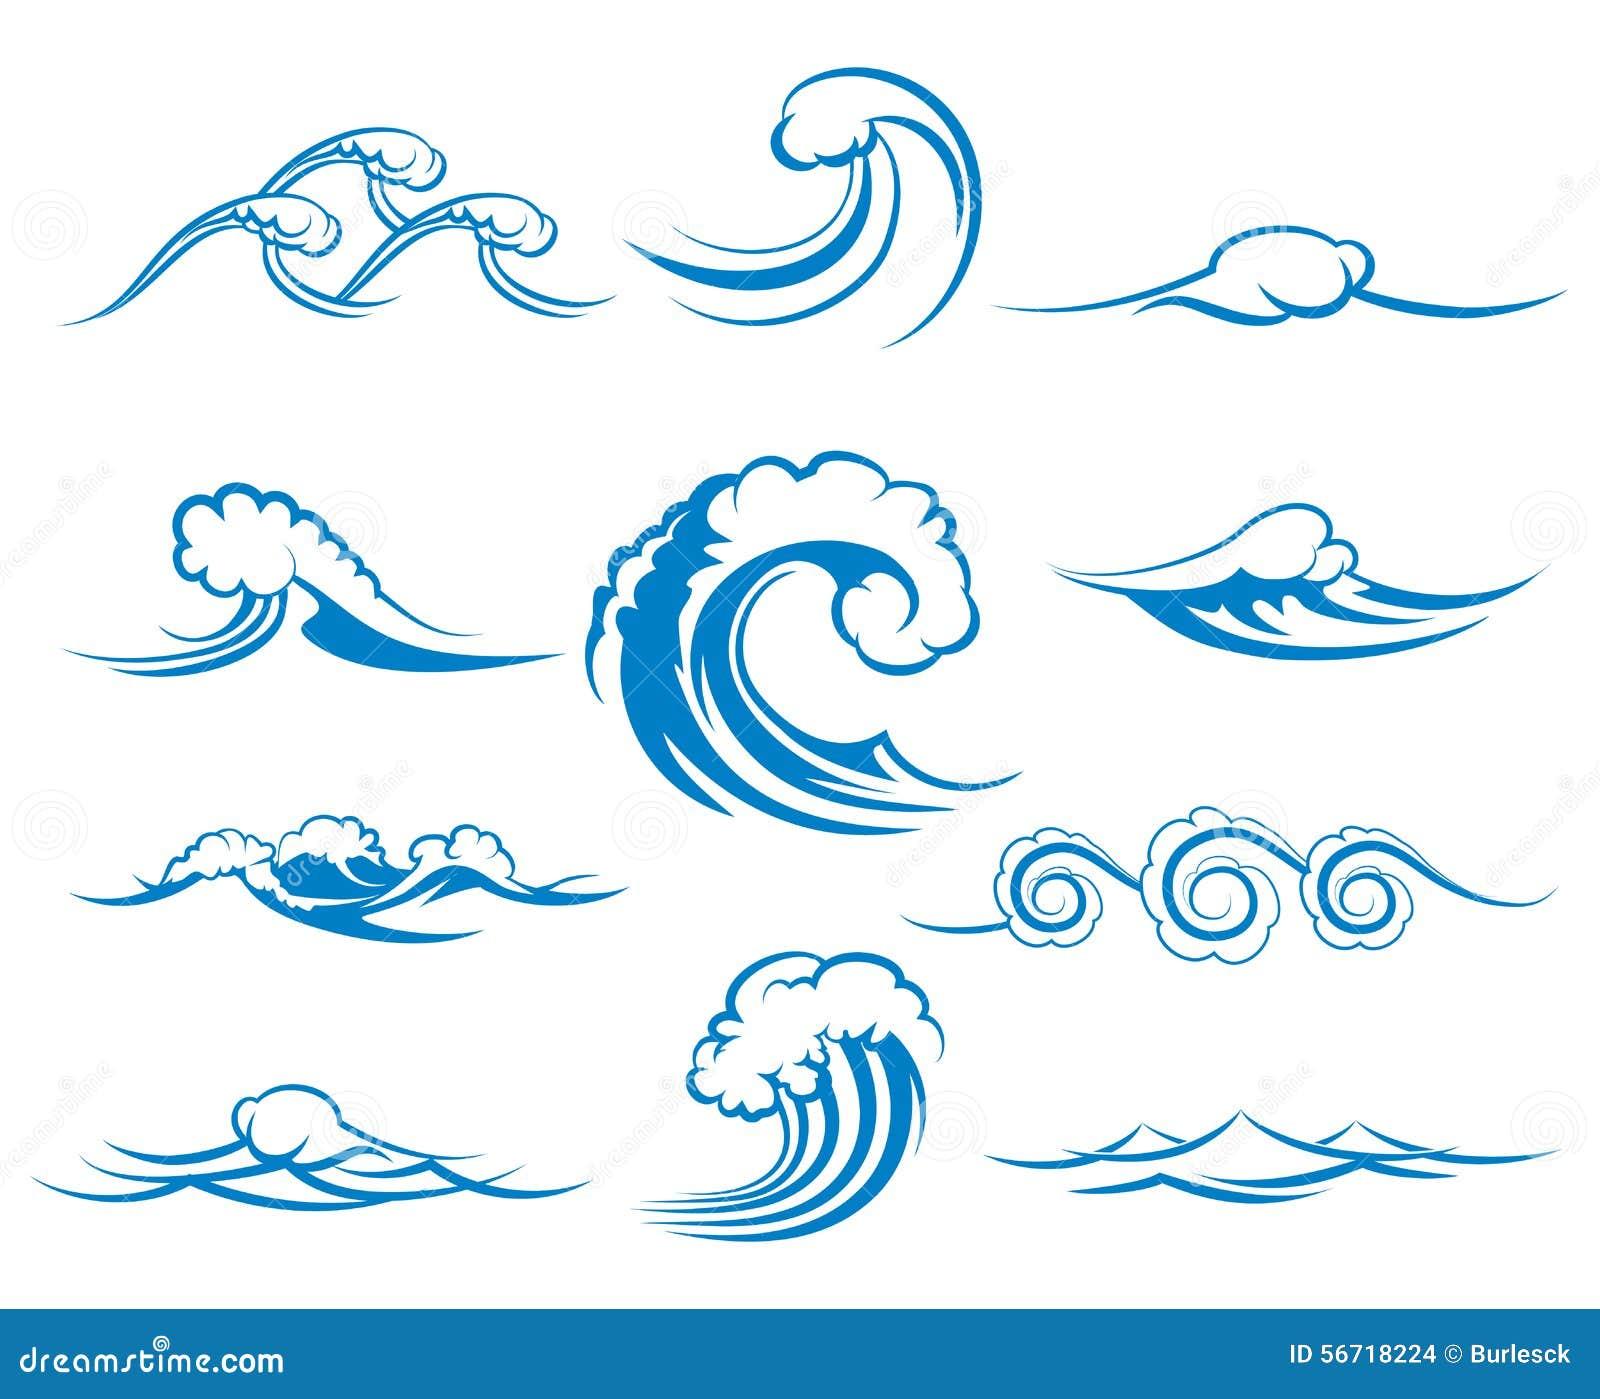 Waves Of Sea Or Ocean Waves, Vector Illustration Stock ...